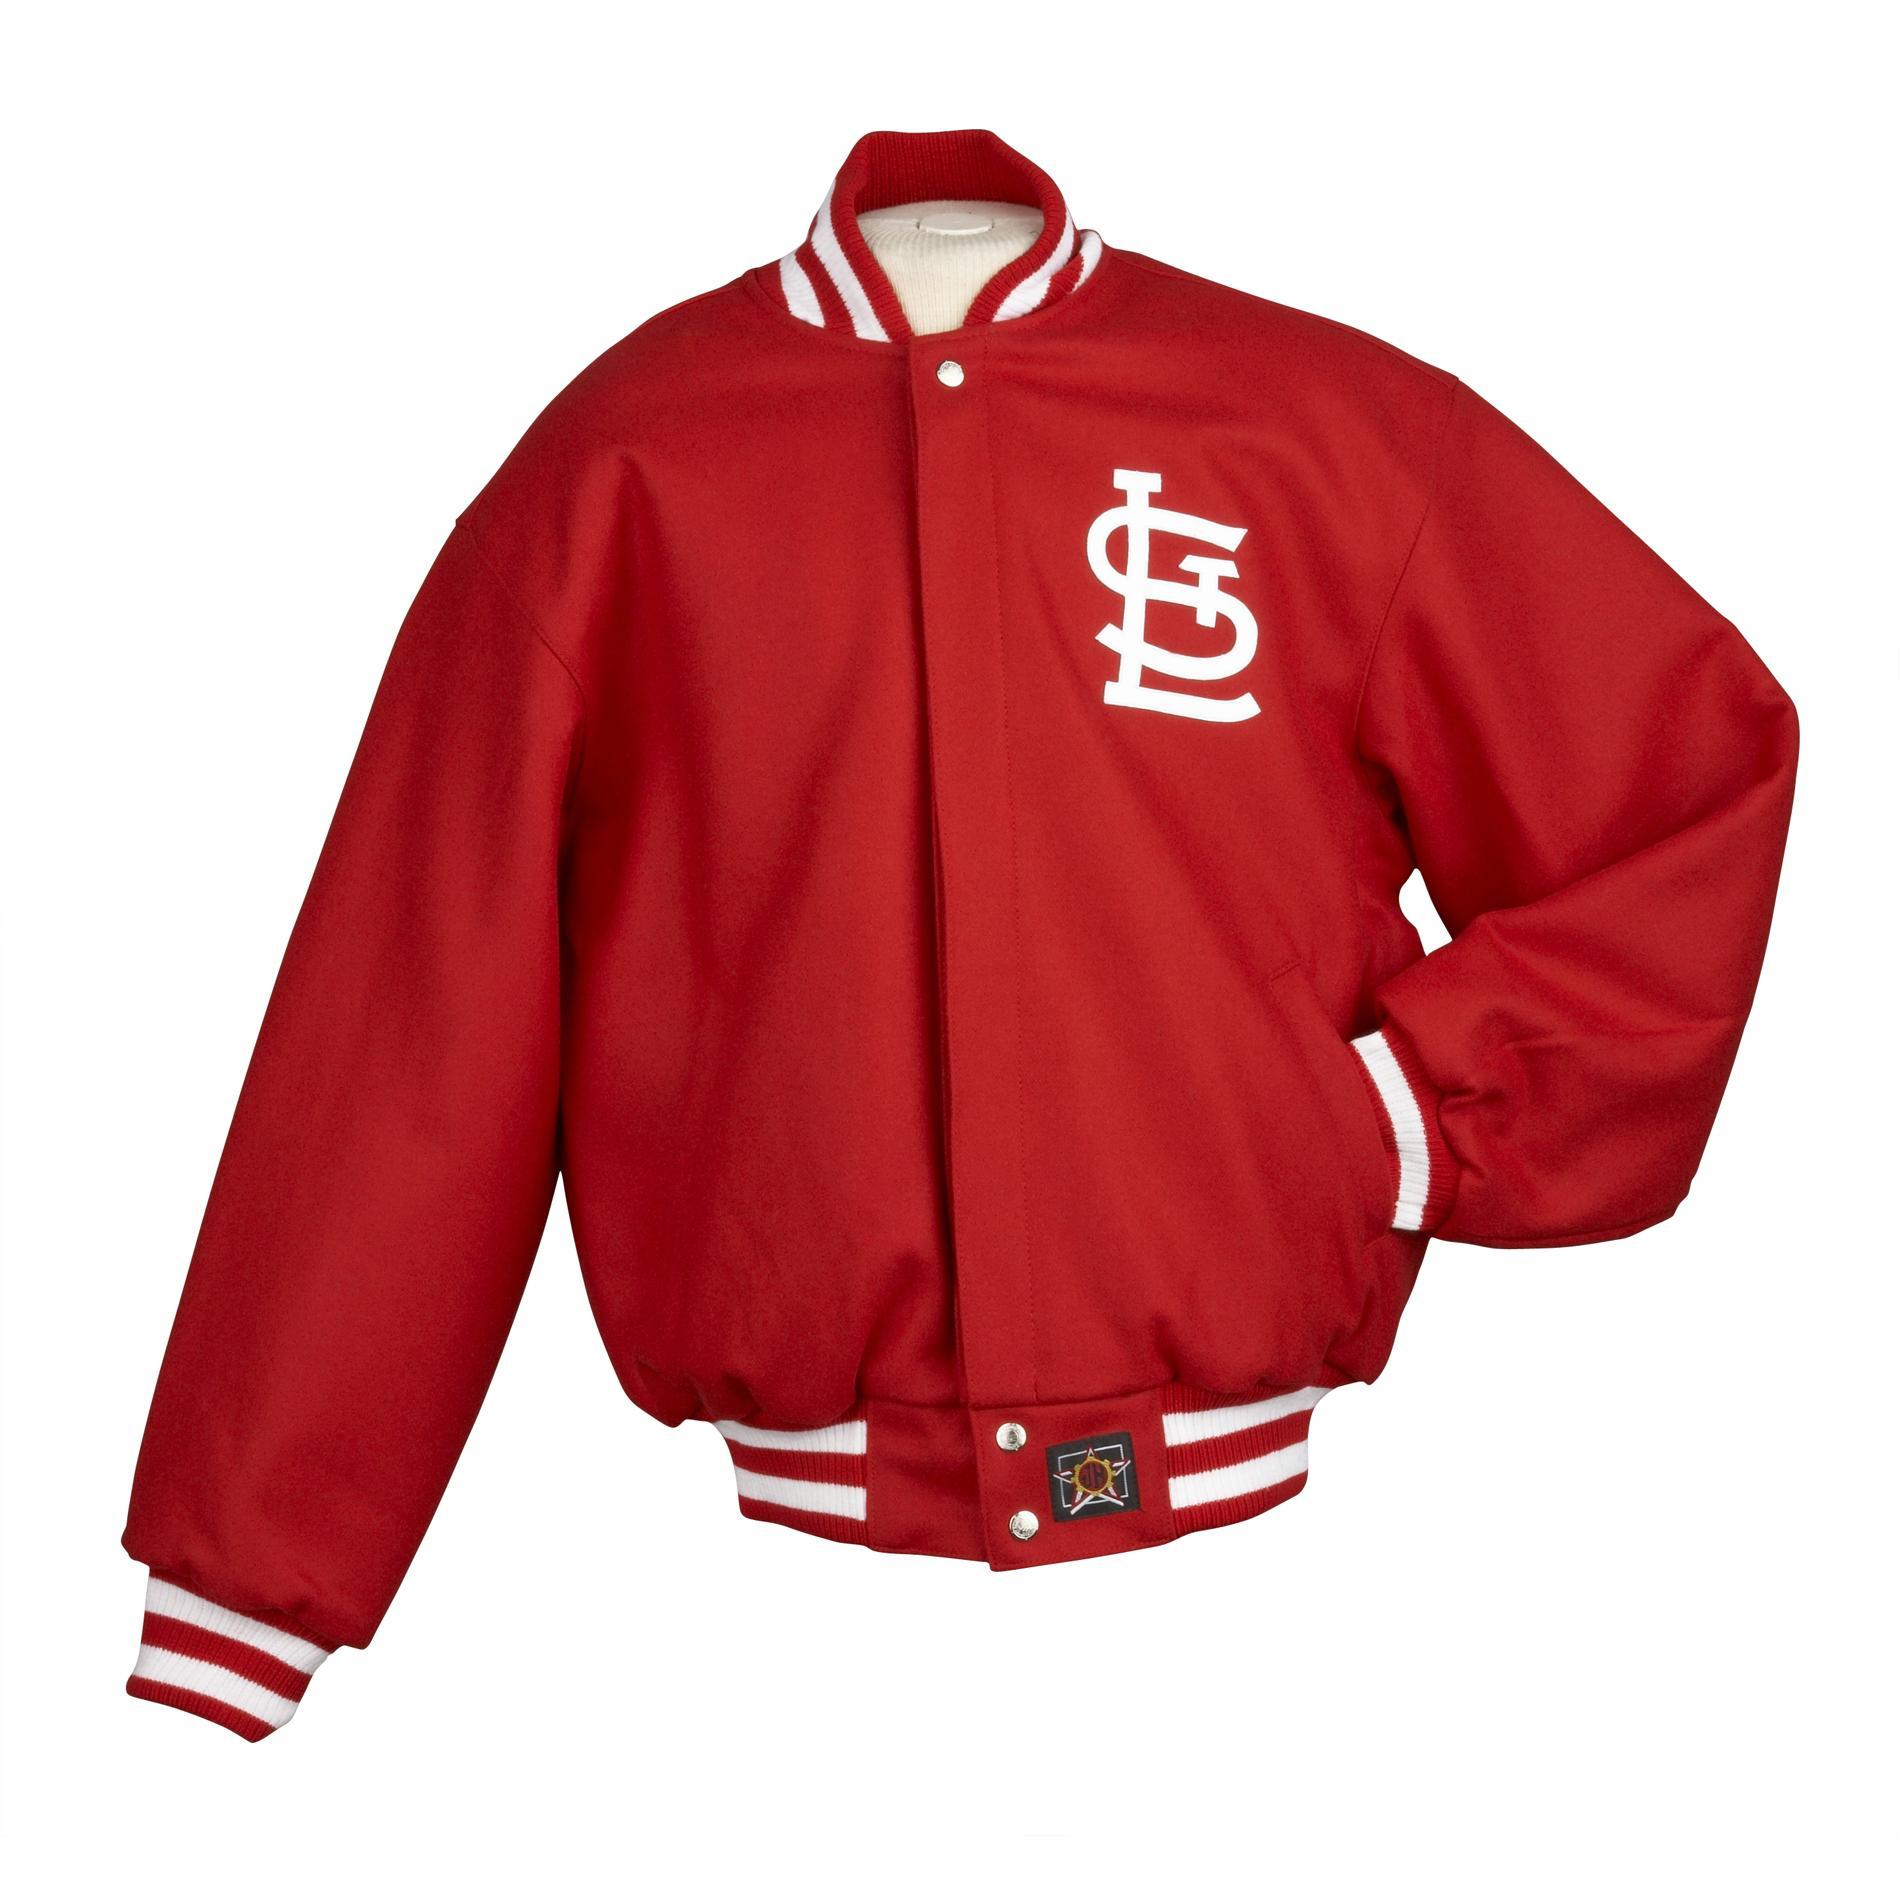 JH Designs Men's St. Louis Cardinals Domestic Wool Jacket